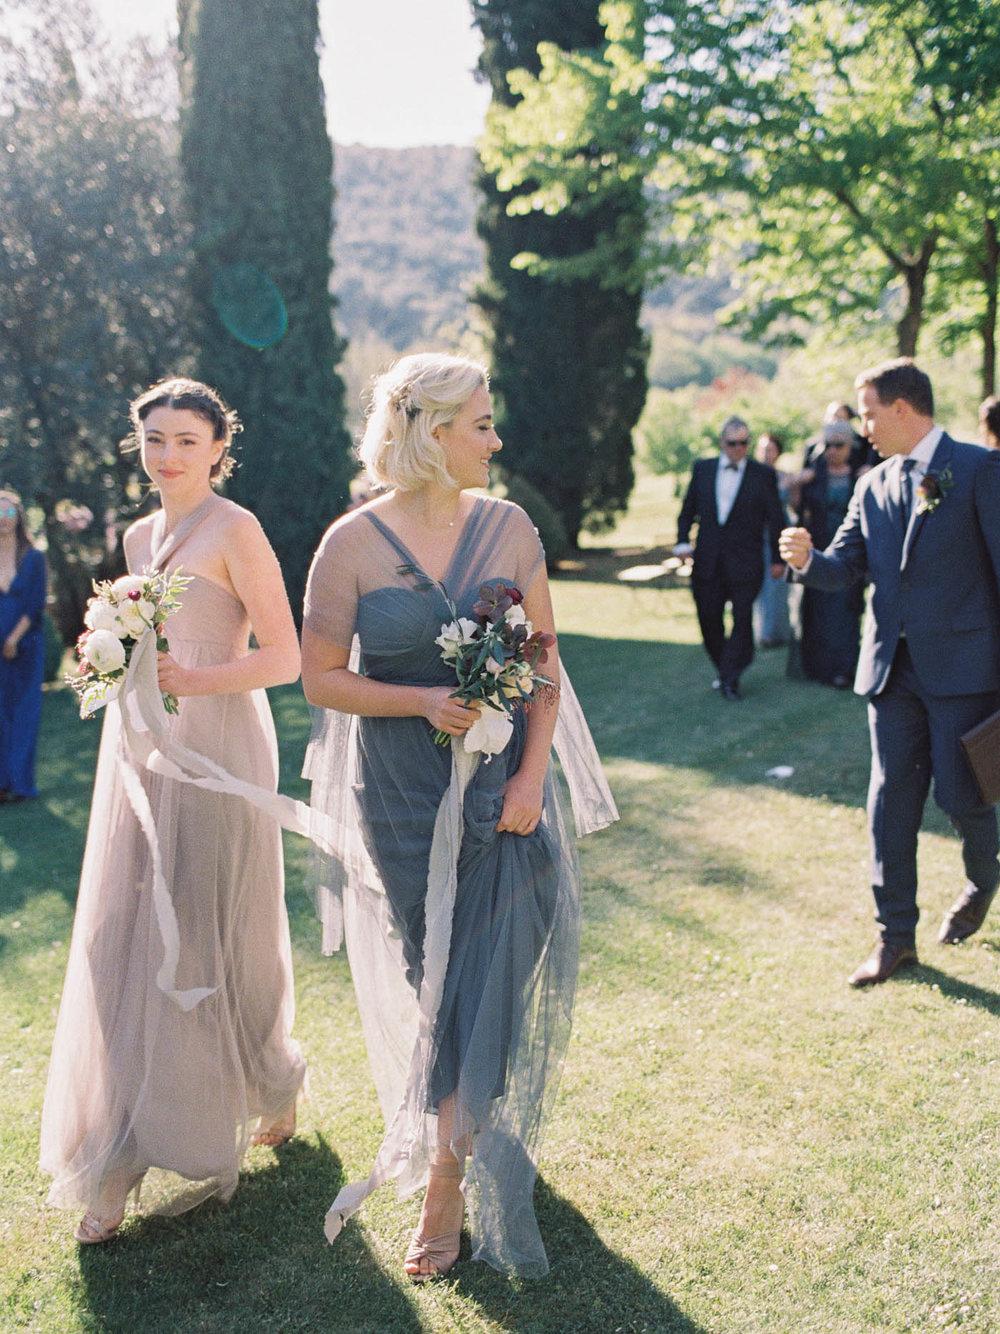 Villa_Cetinale_Wedding-36-Jen_Huang-ElanJacob-244-Jen_Huang-007298-R1-003.jpg